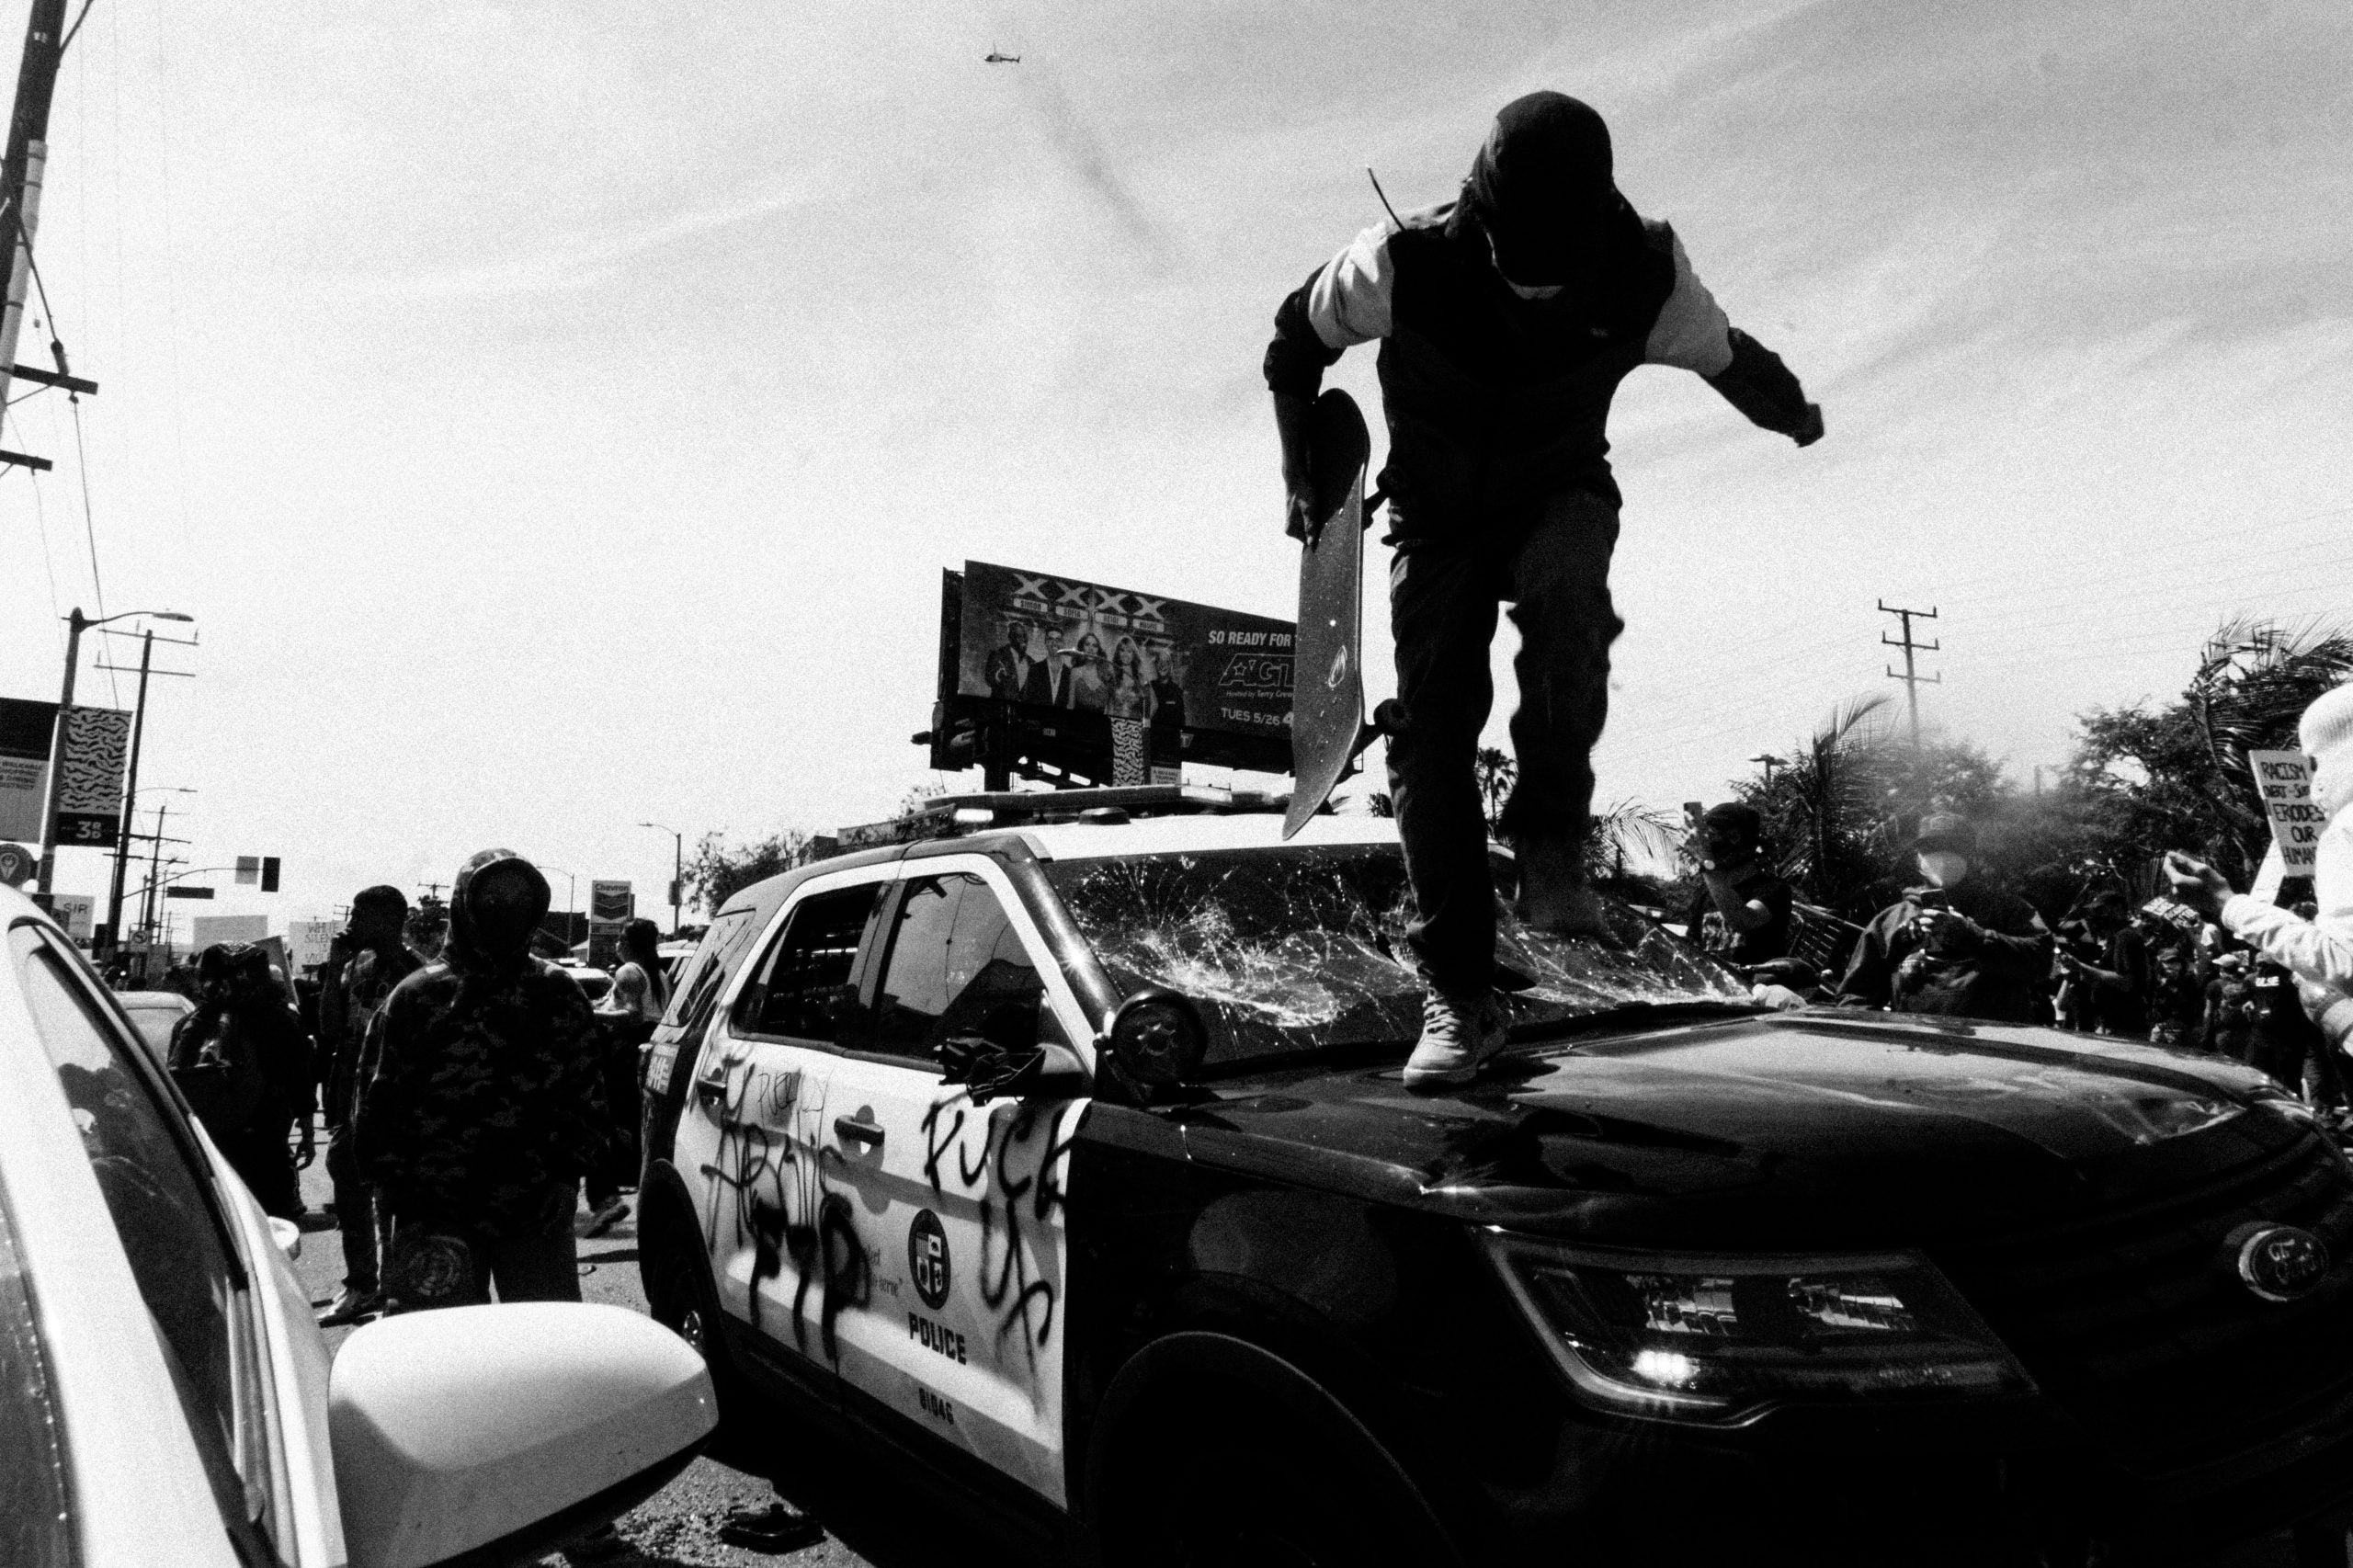 Bellamy Brewster captures West Hollywood protest